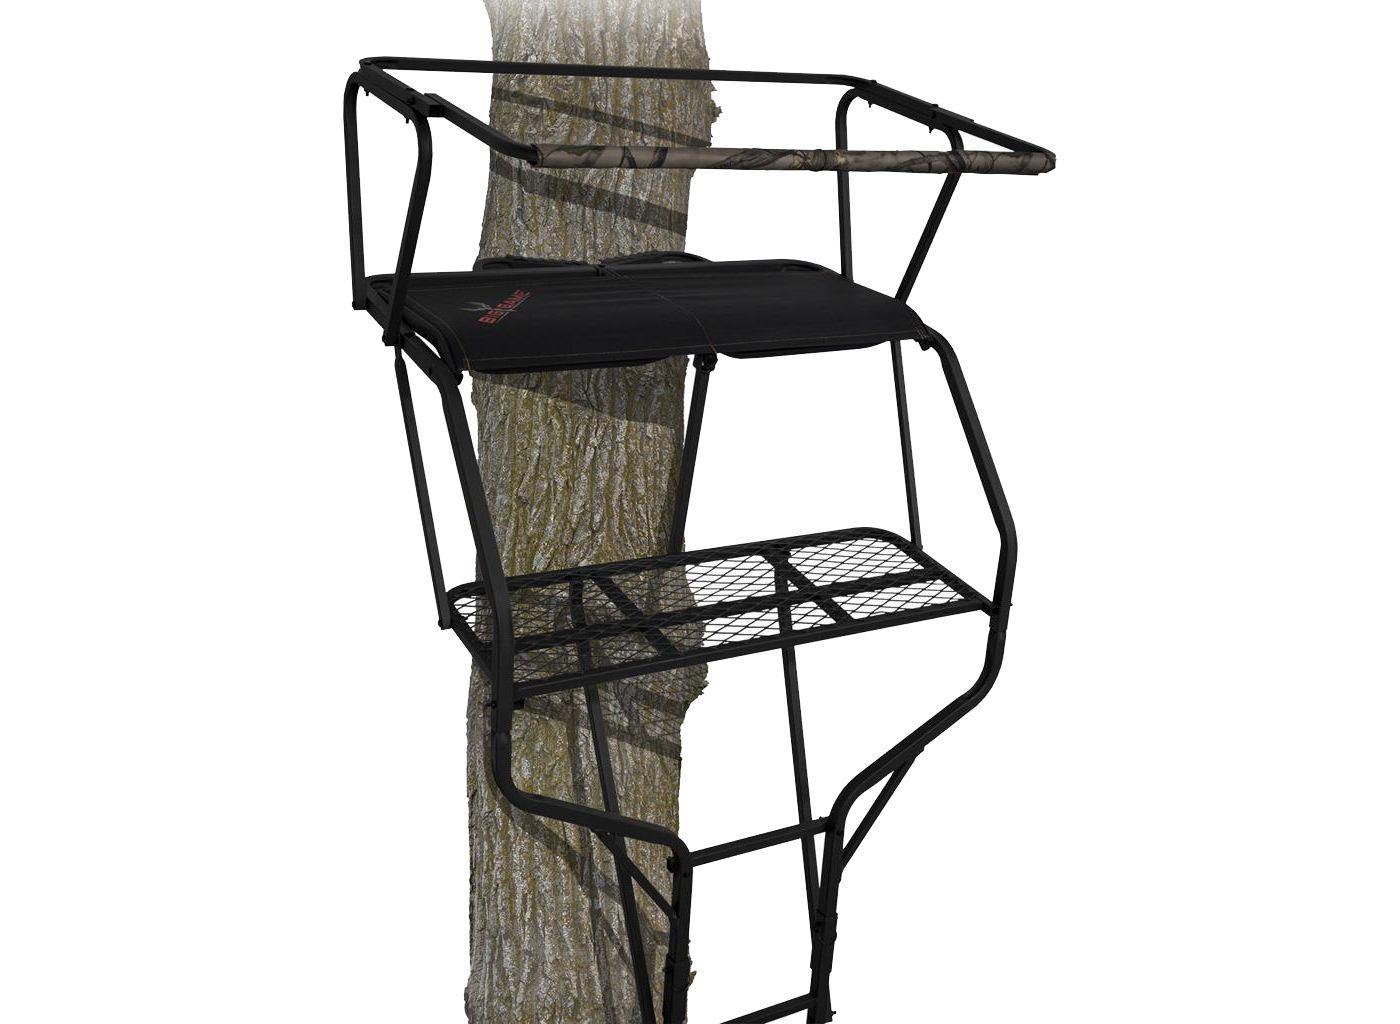 Big Game Treestands Guardian XL 18' Ladder Stand